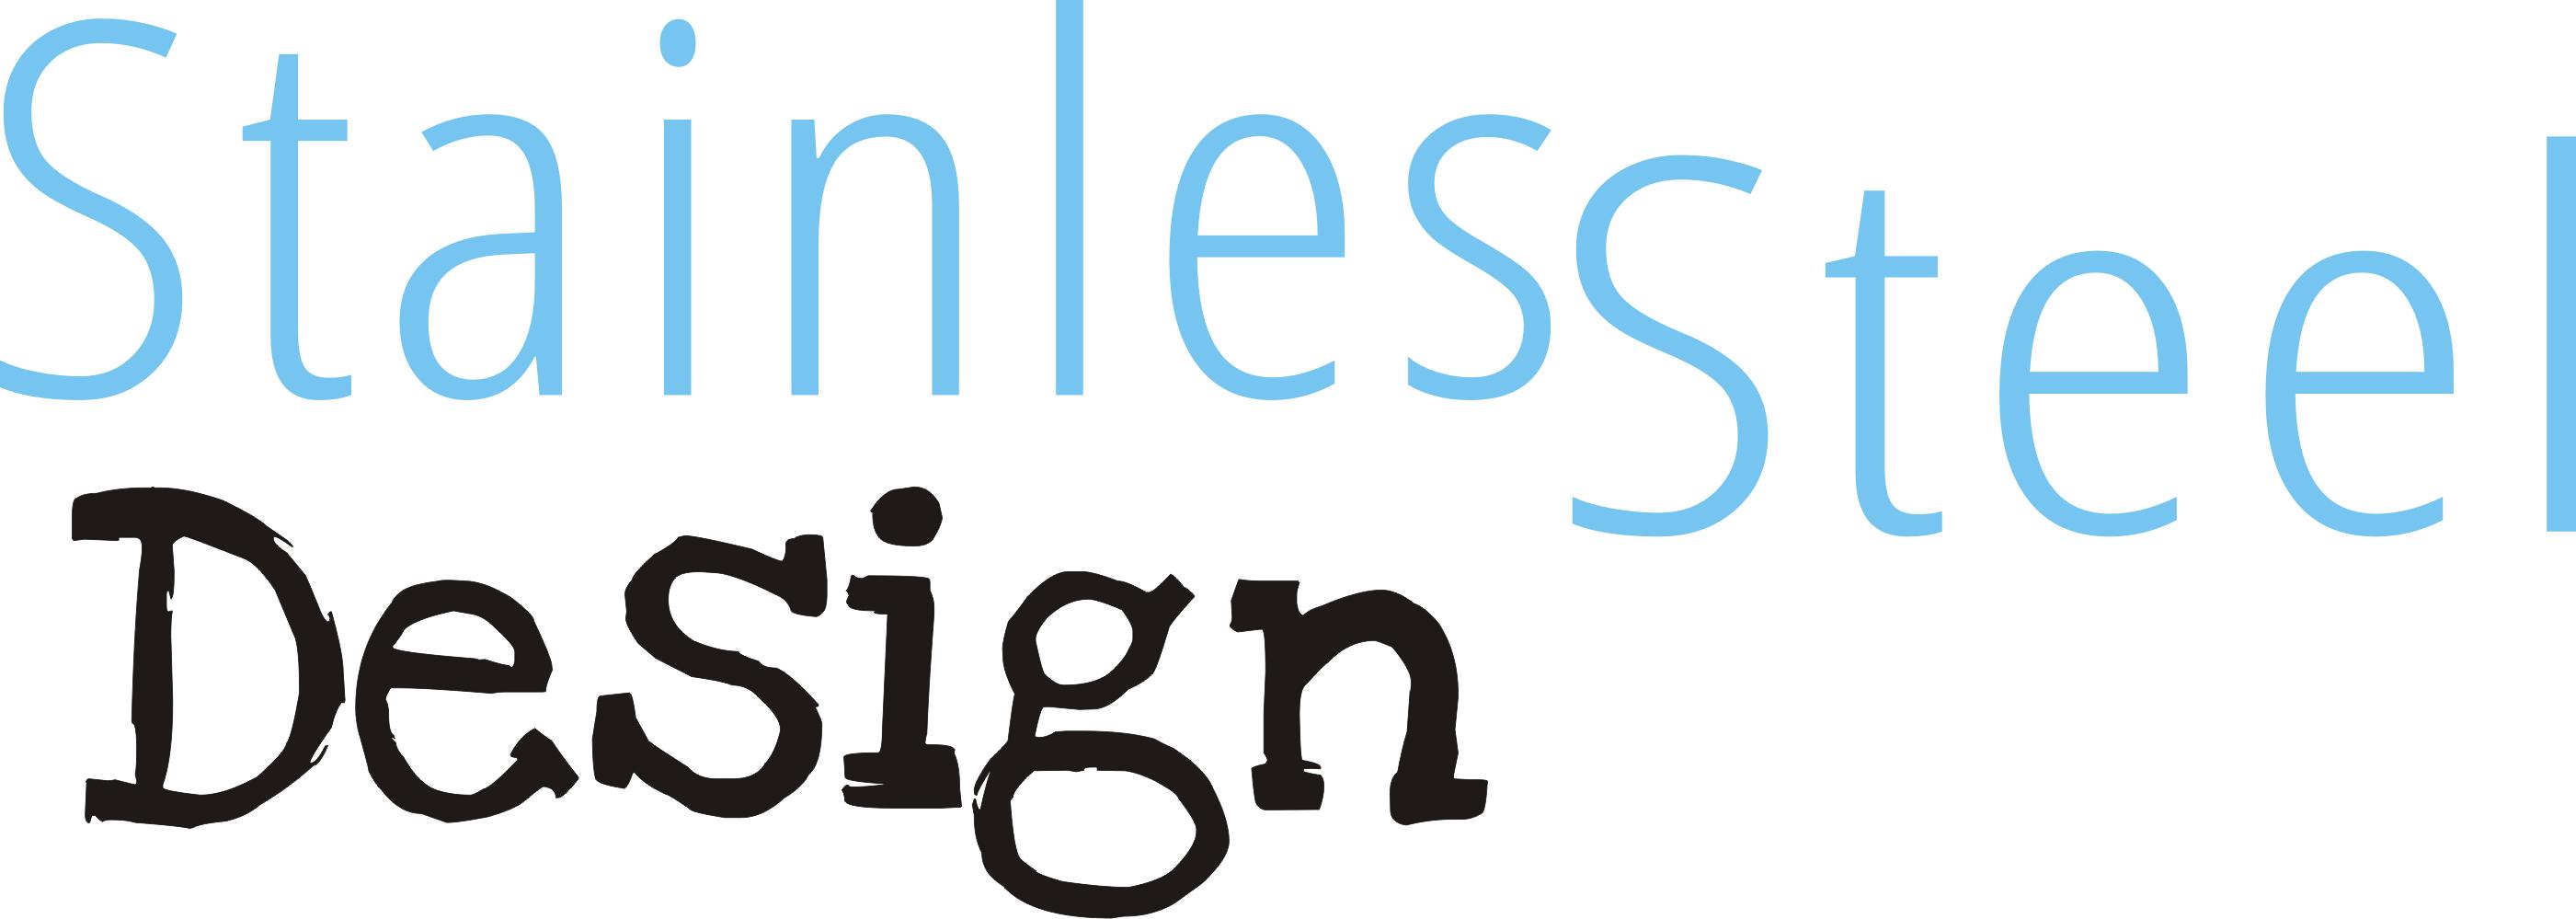 Stainless Steel Design | Christian Gatzemeier | Teistungen